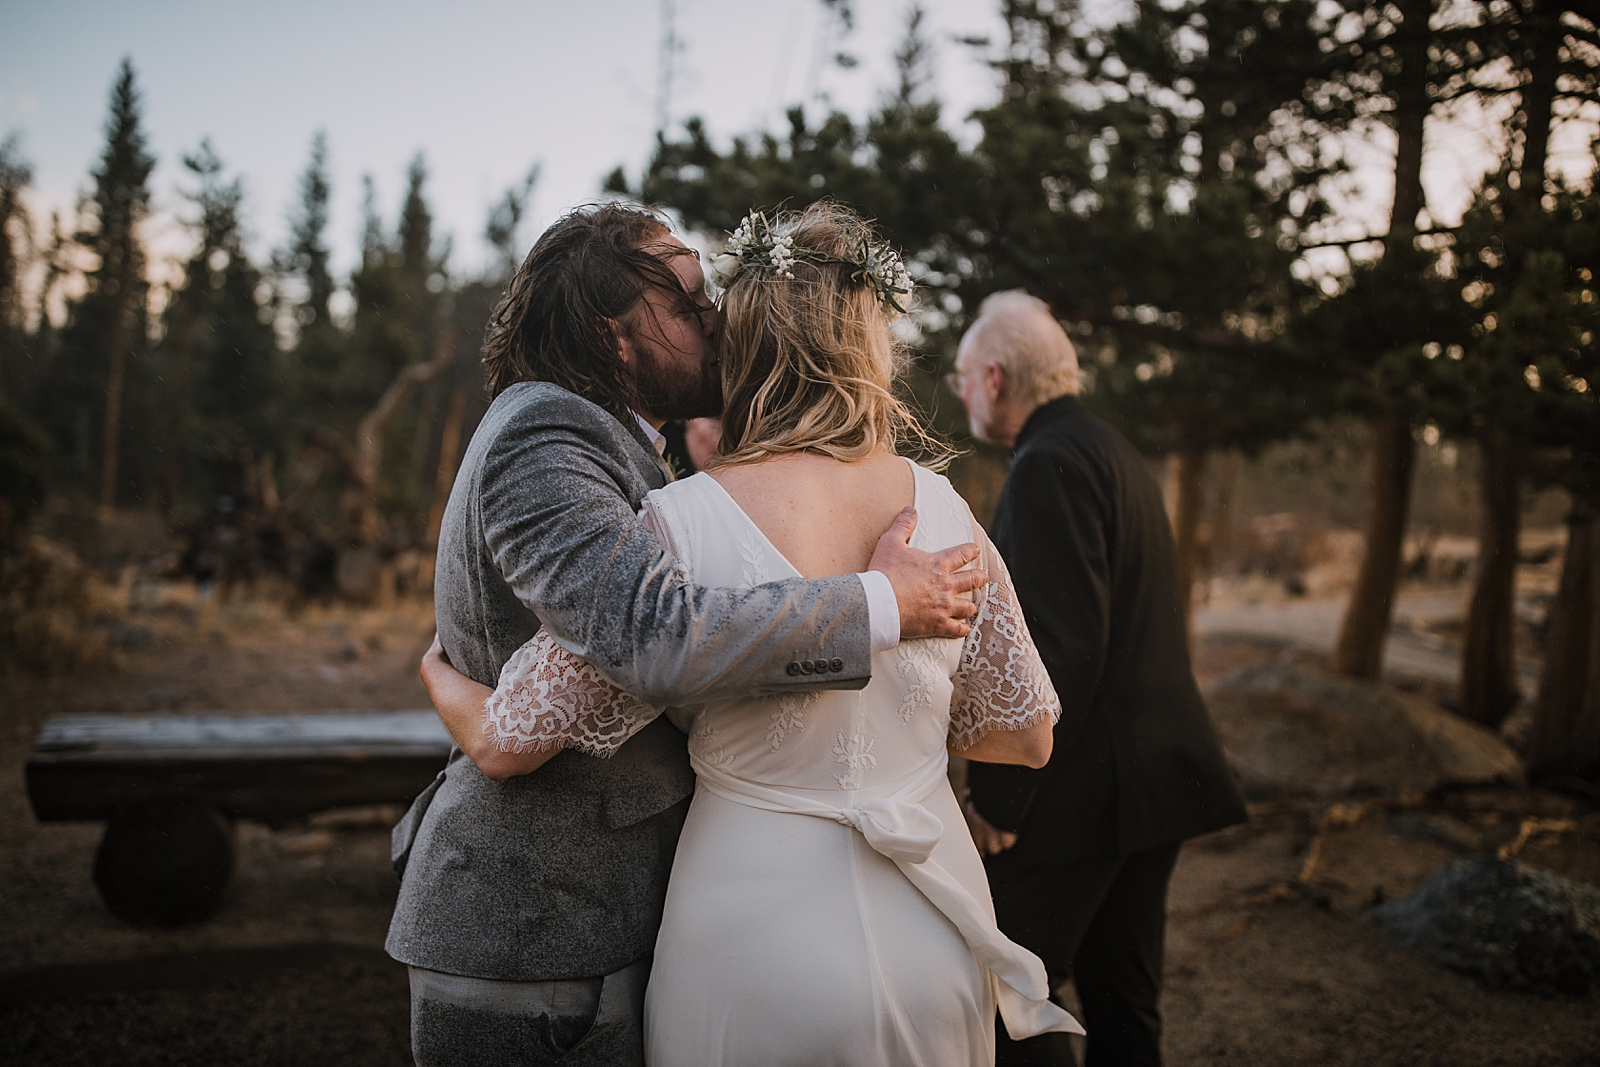 elopement kiss, sprague lake dock elopement, sunrise elopement, colorado elopement, sprague lake elopement, rocky mountain national park elopement, adventurous colorado hiking elopement